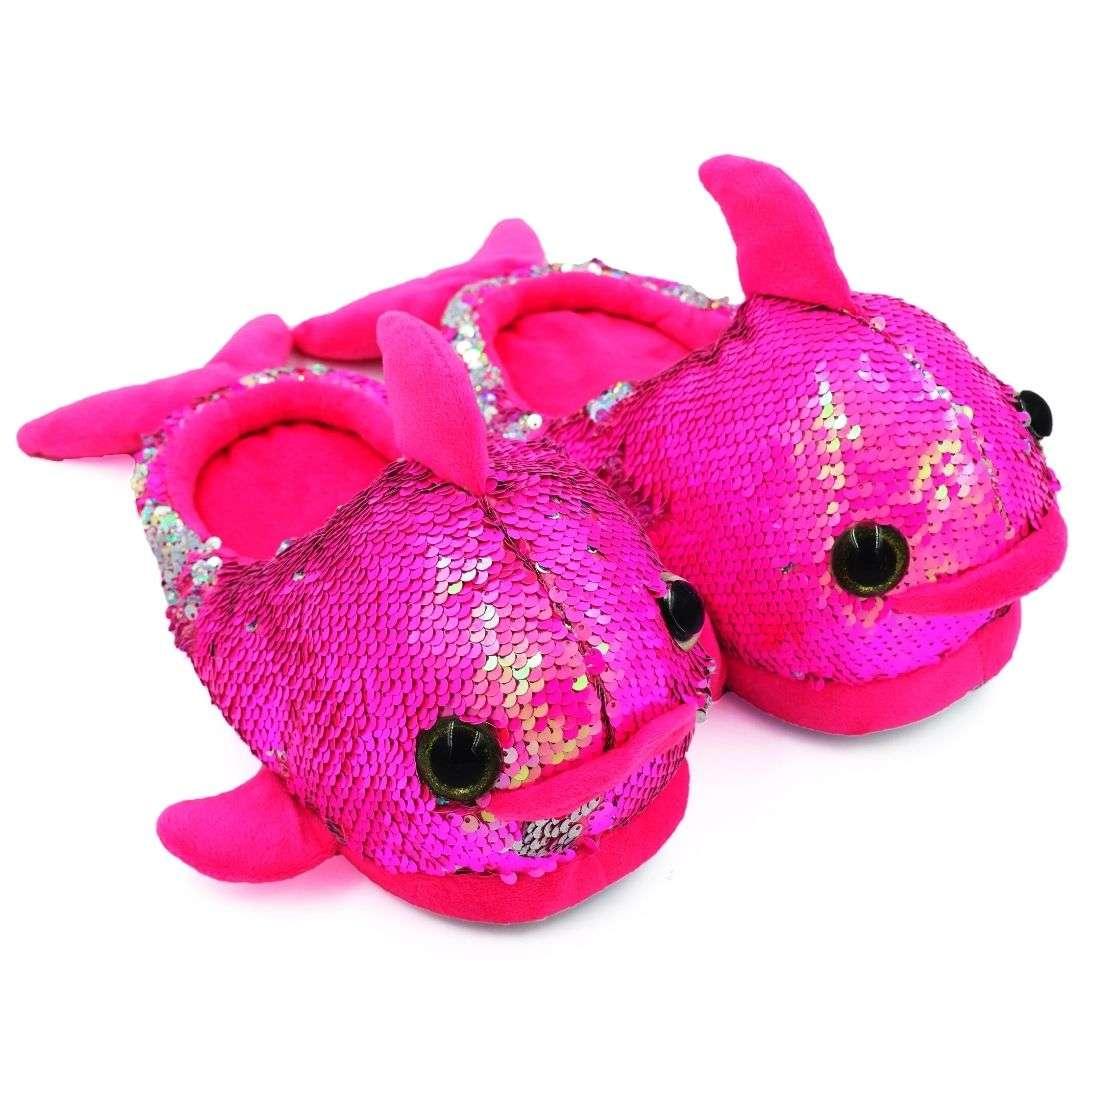 Fish Plush Slipper Pink - Bulk Deal